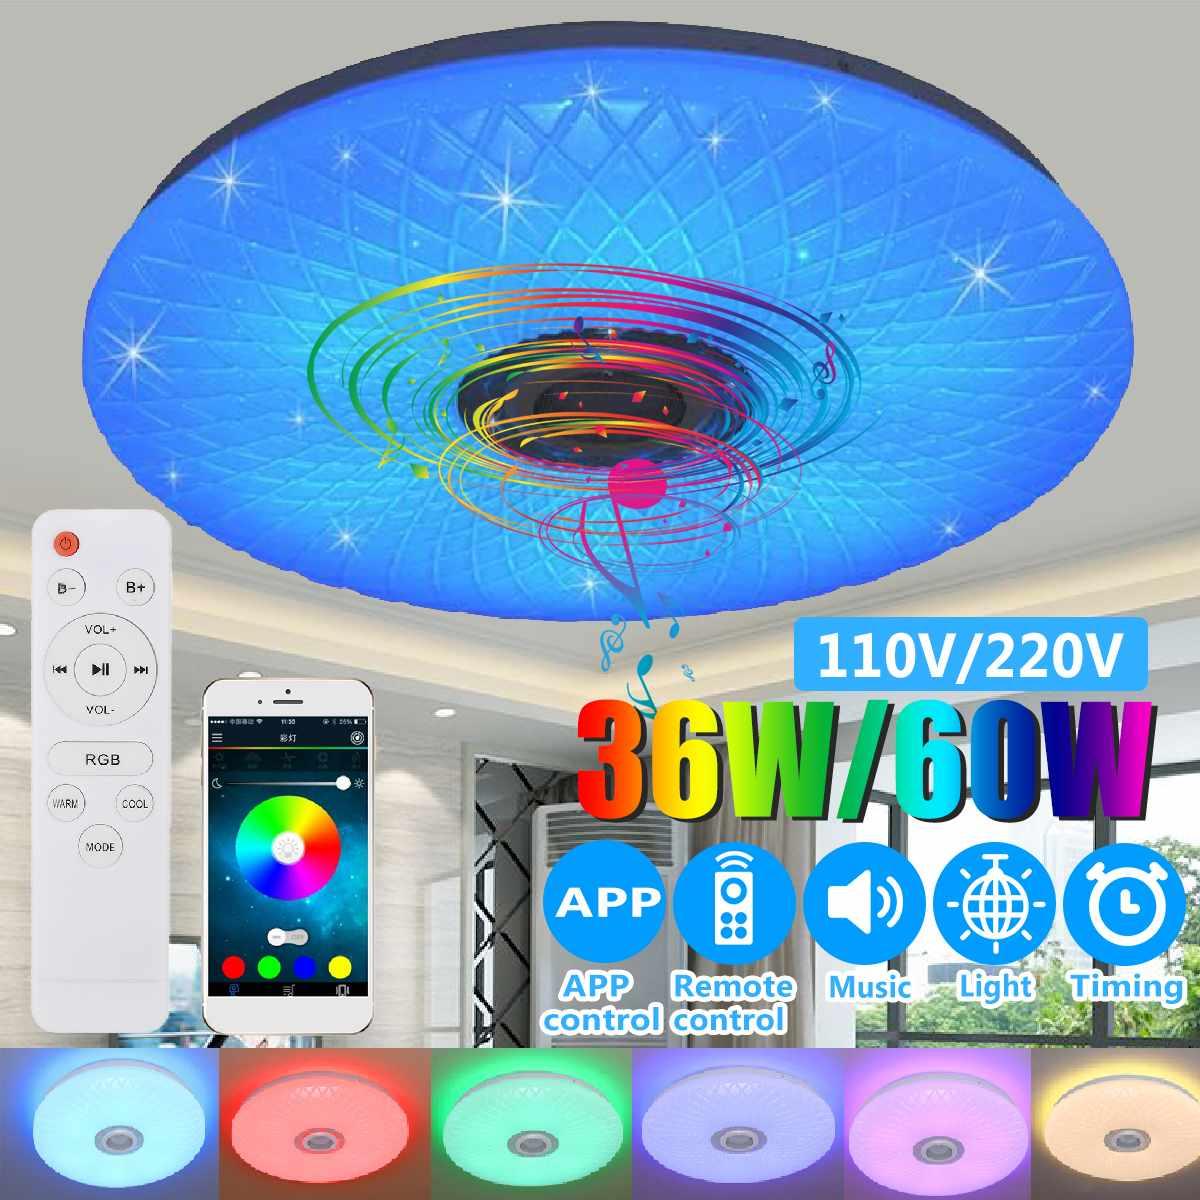 Modern RGB LED Ceiling Light home lighing 36W 60W 40cm APP Remote Control bluetooth Music Light Innrech Market.com